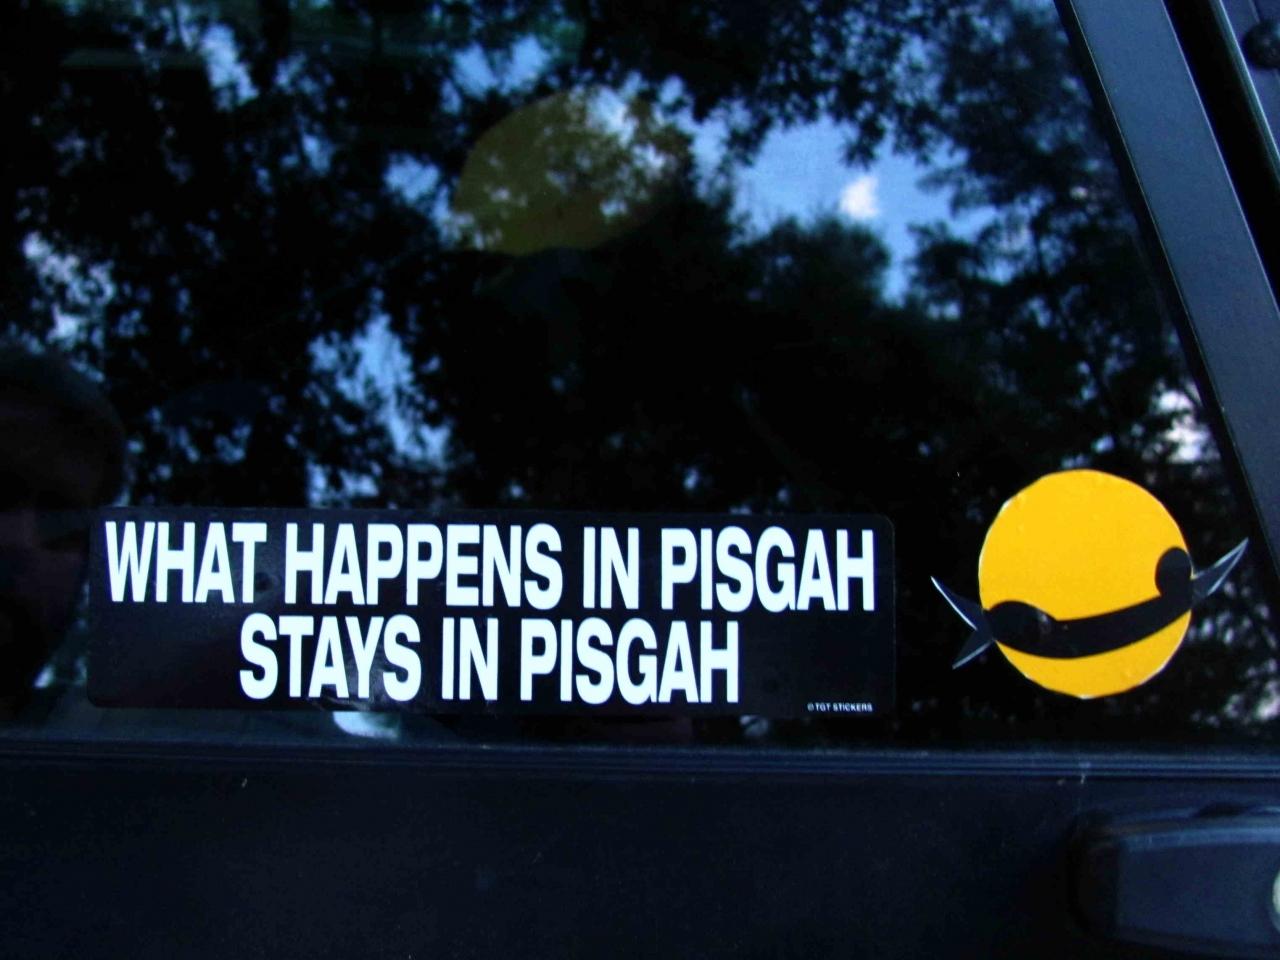 Pisgah